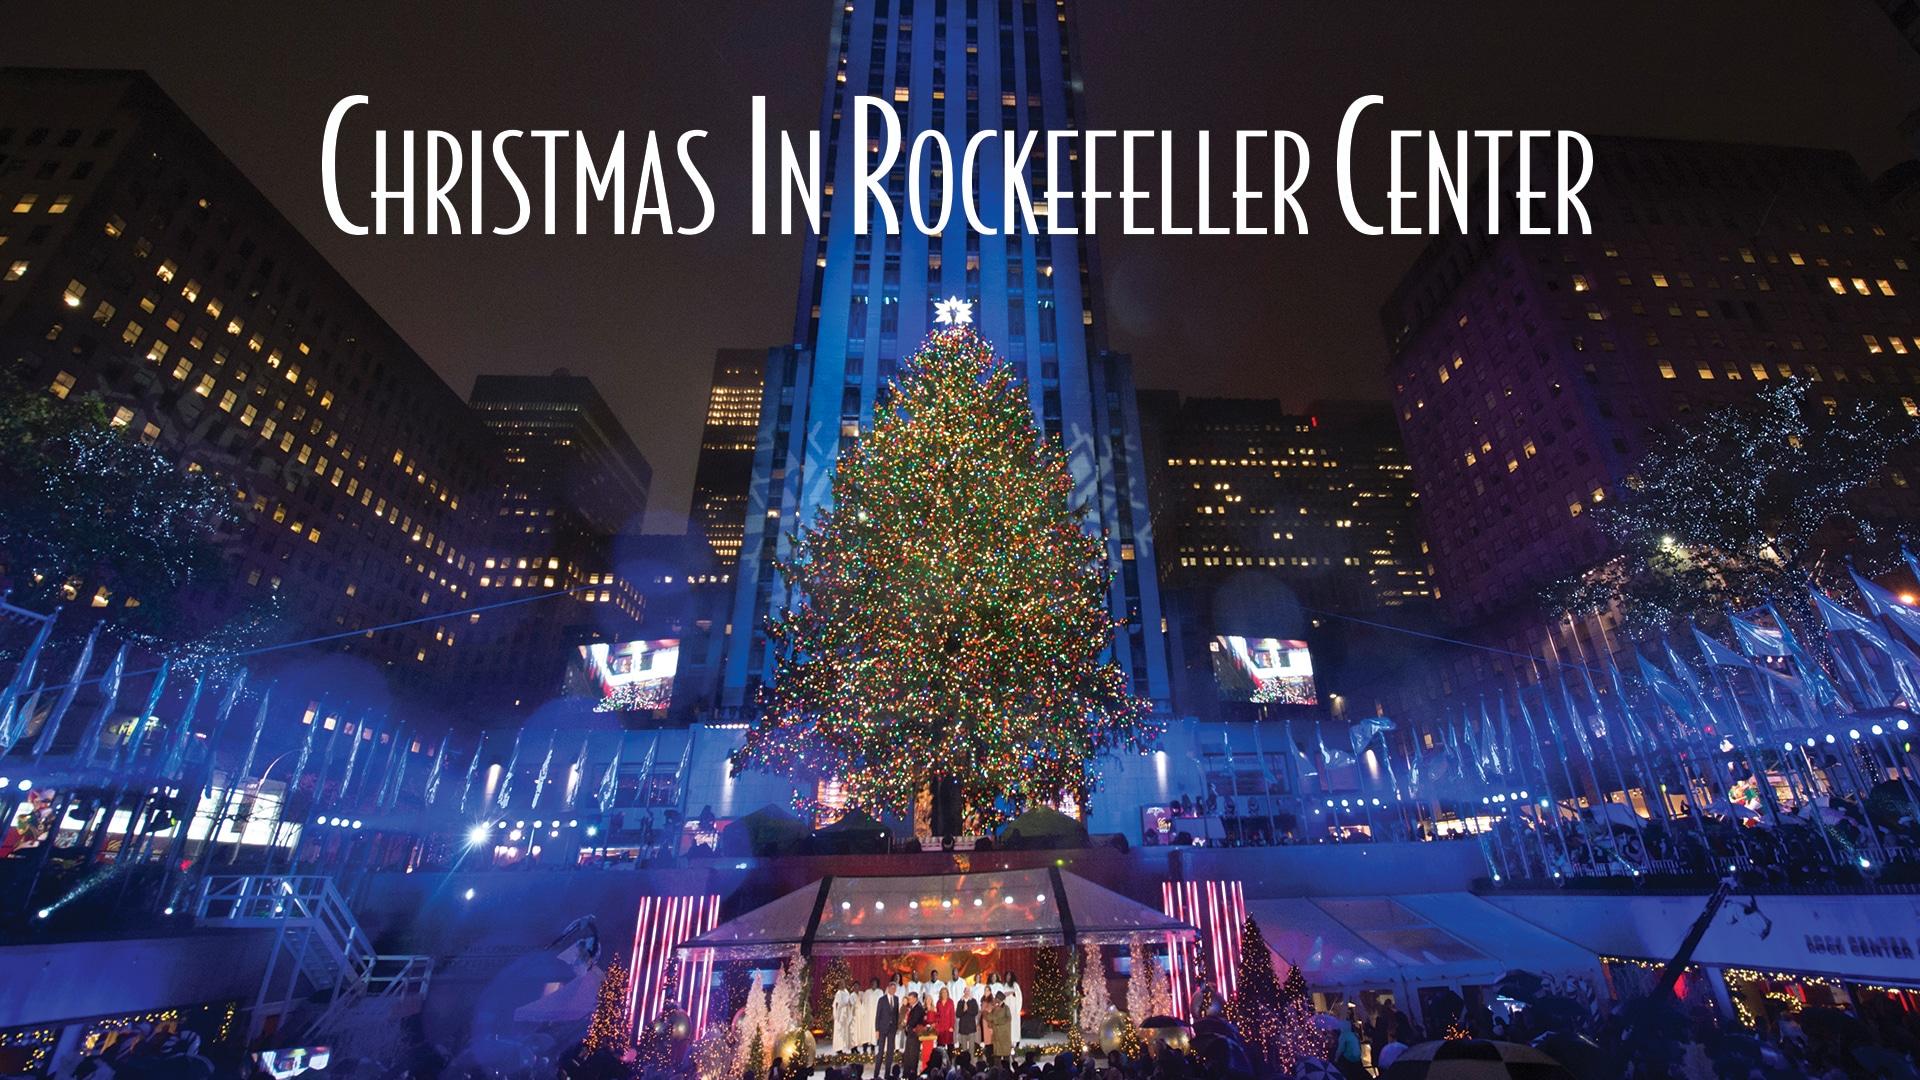 Christmas in Rockefeller Center - NBC.com